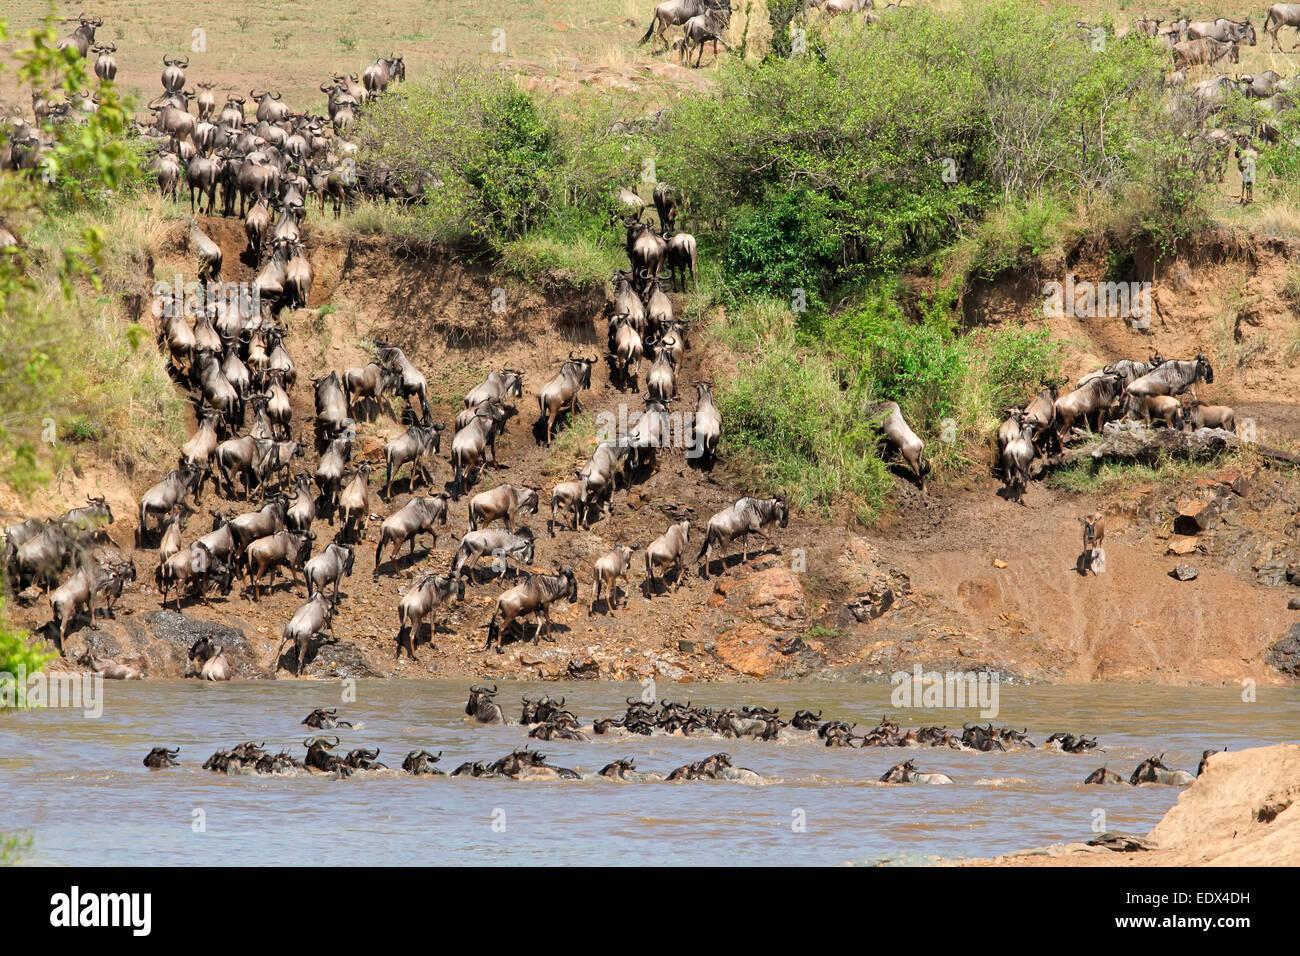 Migratory blue wildebeest (Connochaetes taurinus) crossing the Mara river, Masai Mara National Reserve, Kenya - Stock Image